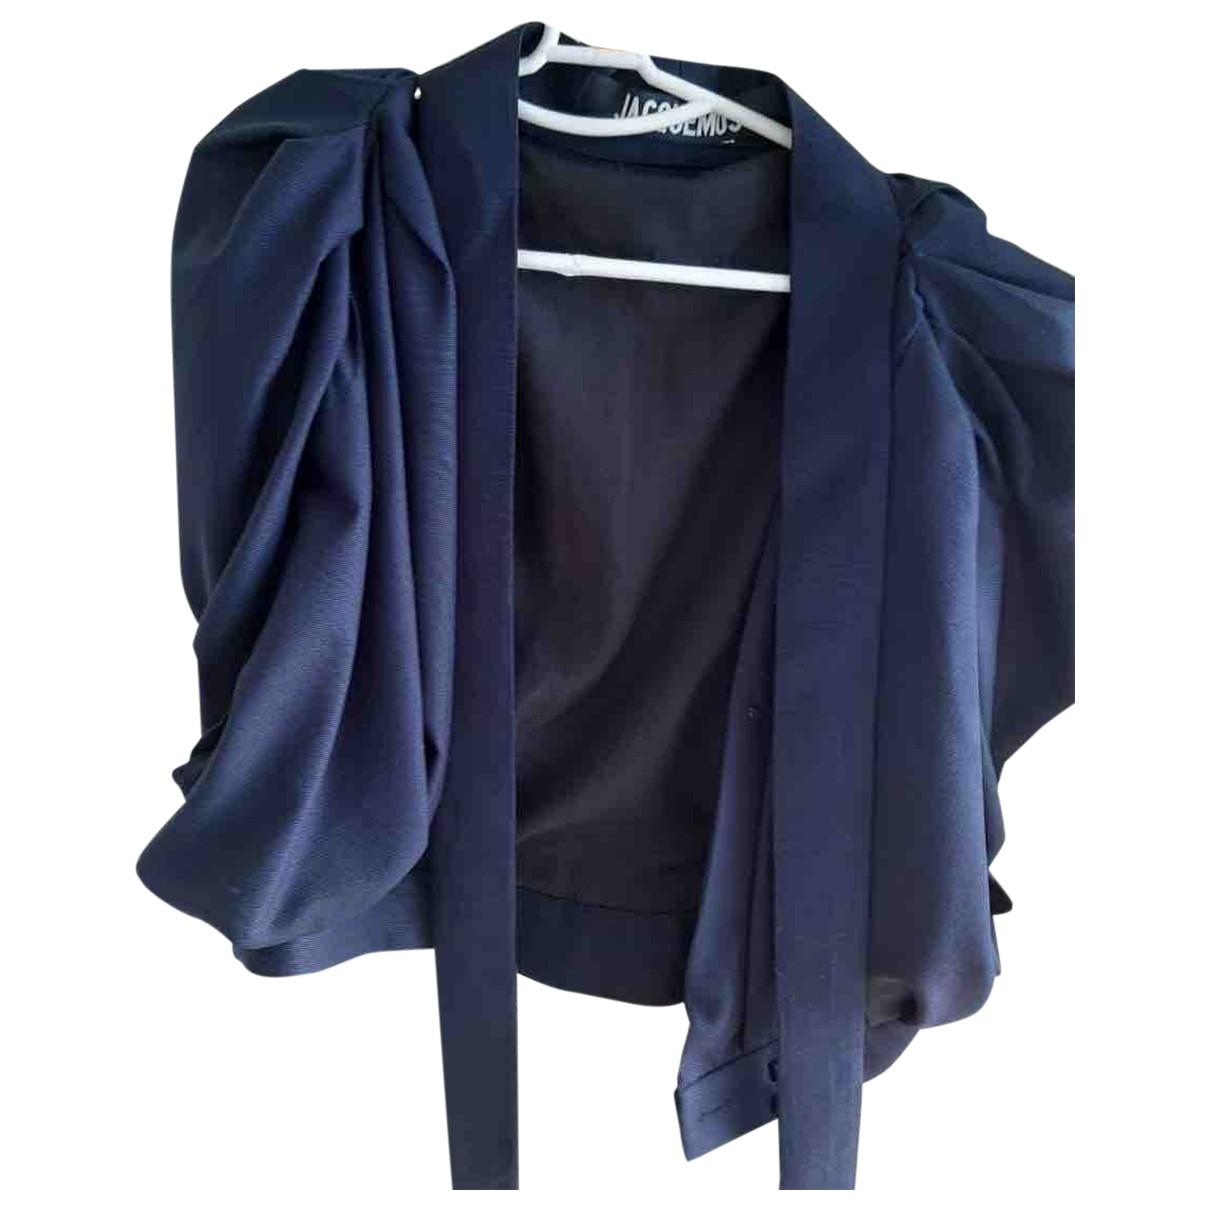 Jacquemus L'Amour d'un Gitan Navy Wool  top for Women 36 FR